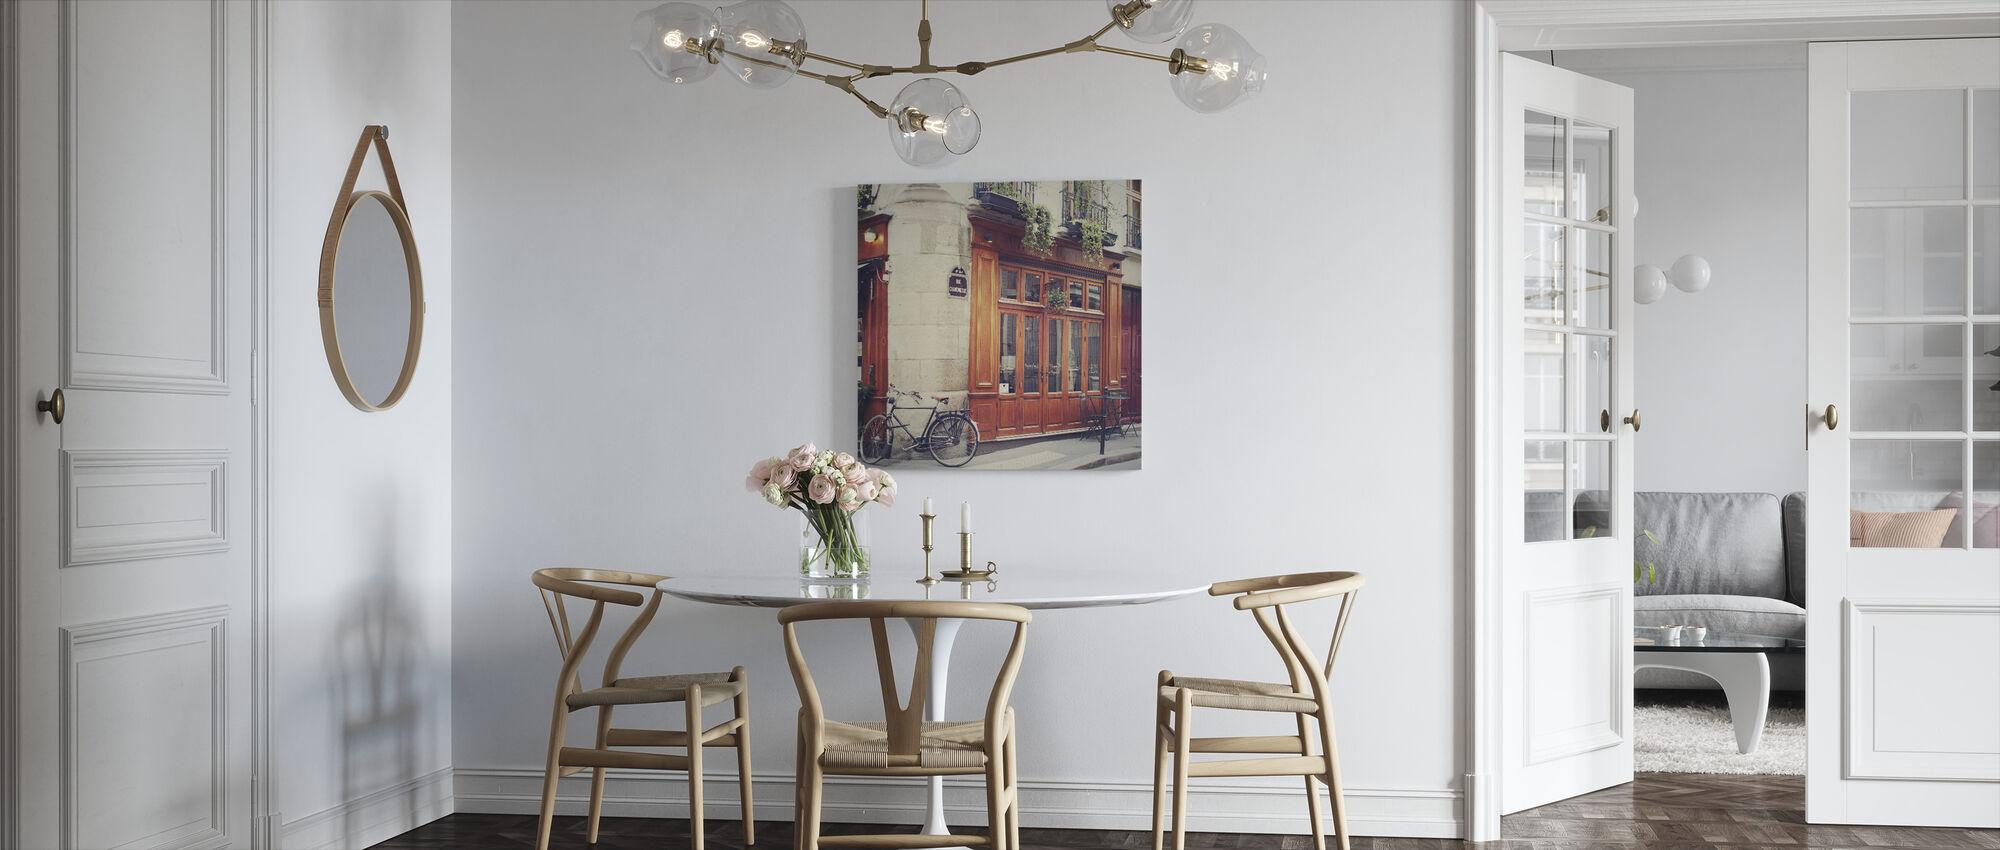 Chanoinessewa-straat - Canvas print - Keuken